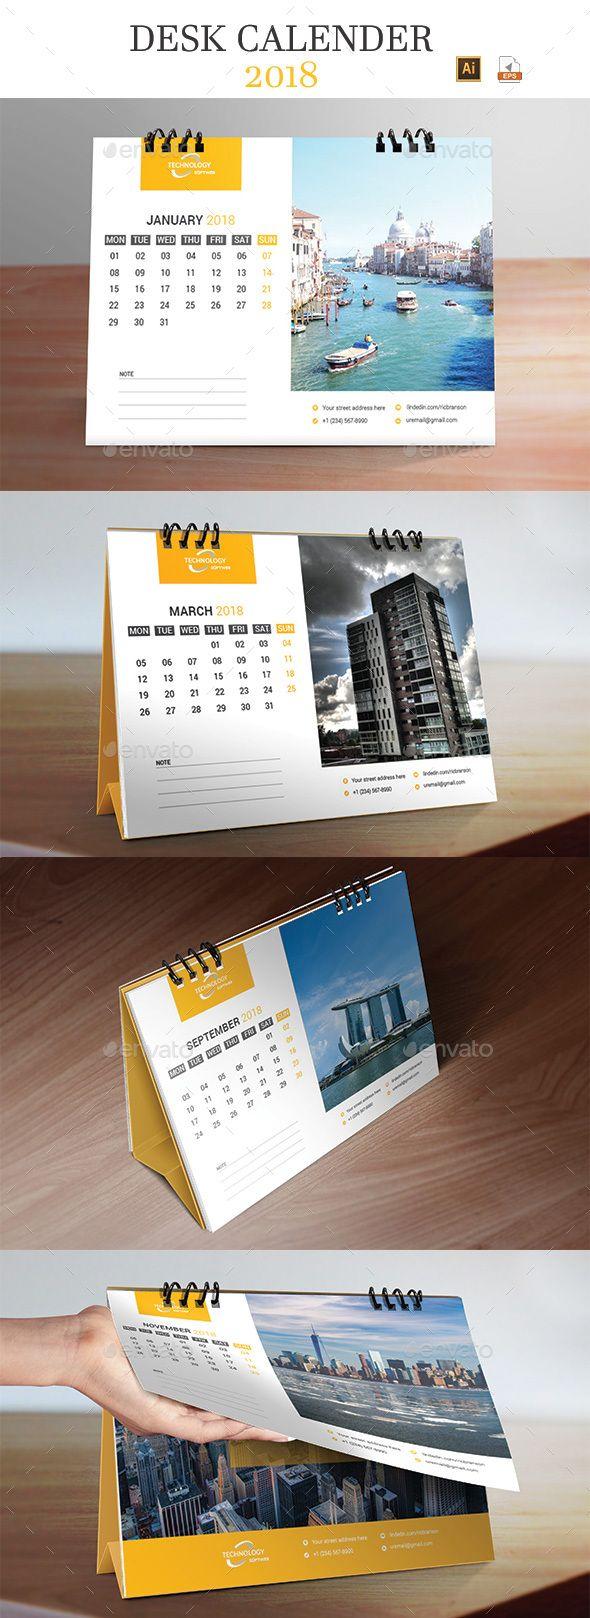 Desk Calendar 2018 - #Calendars #Stationery Download here: https://graphicriver.net/item/desk-calendar-2018/20065261?ref=alena994